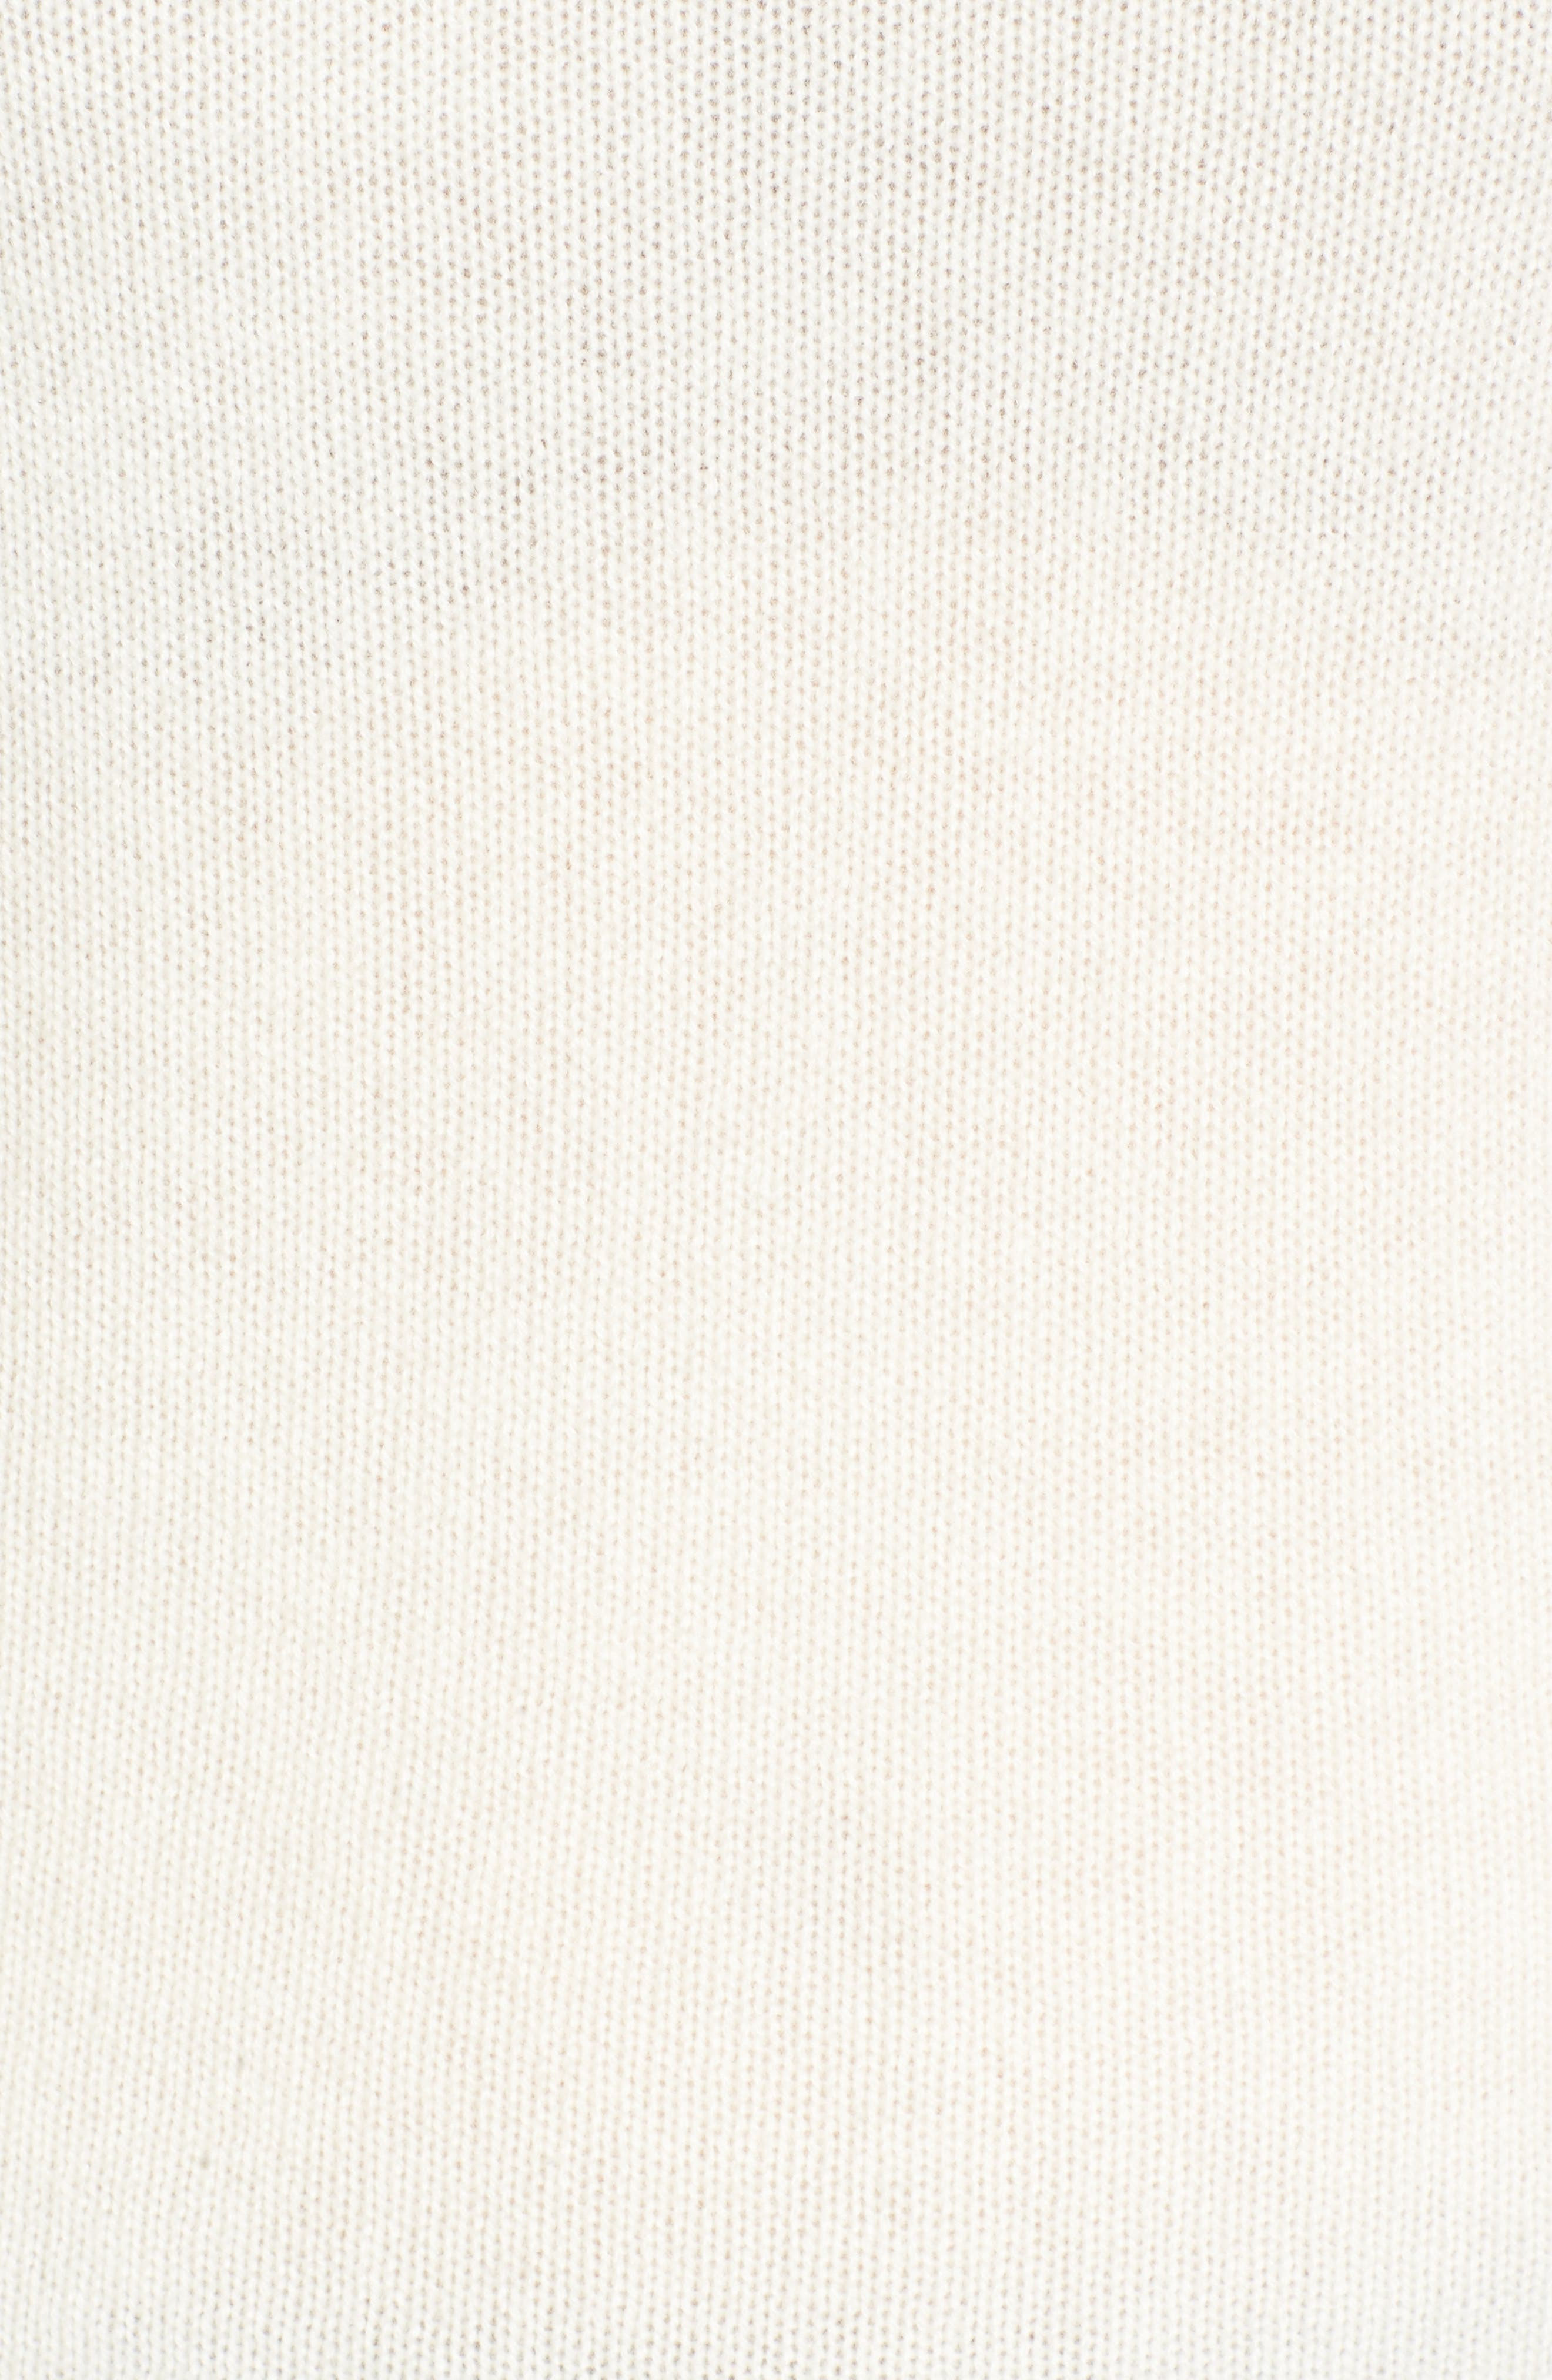 Cashmere Crewneck Sweater,                             Alternate thumbnail 5, color,                             902